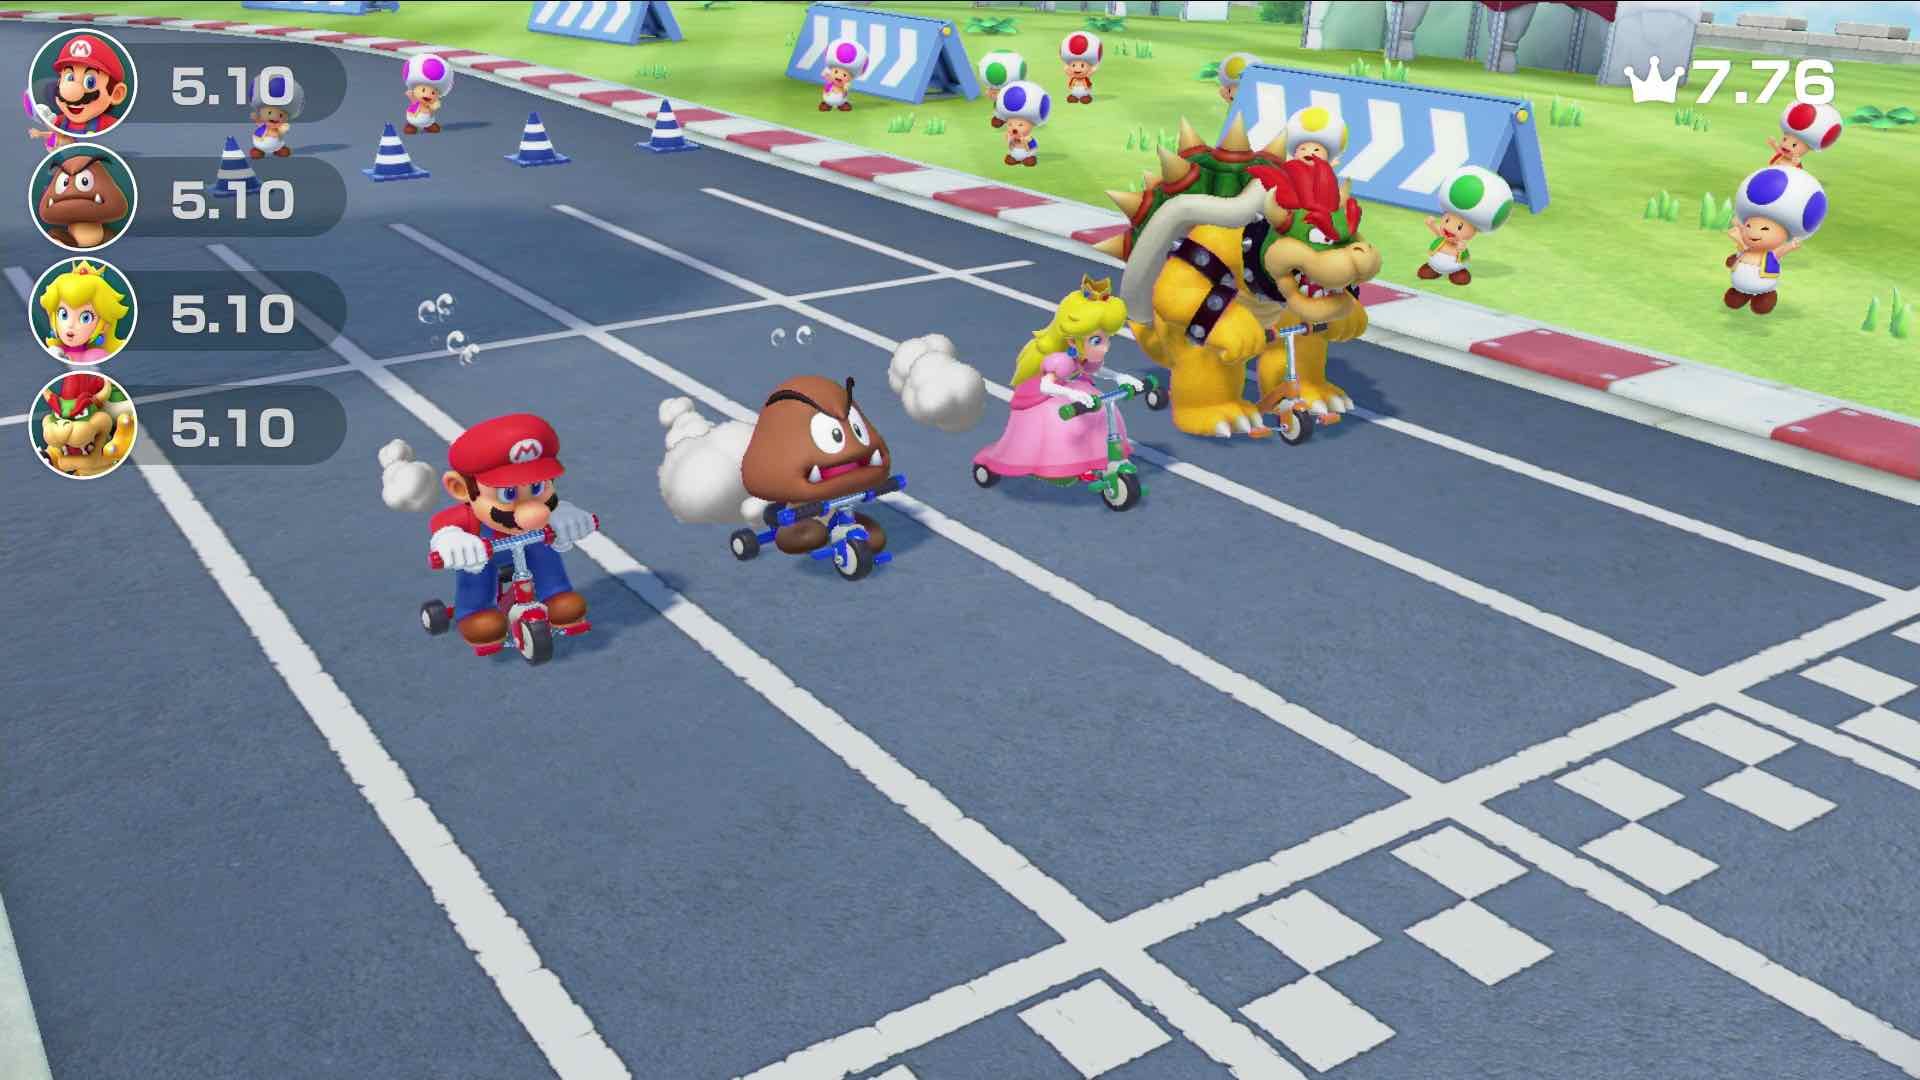 Trike Harder Super Mario Party Screenshot